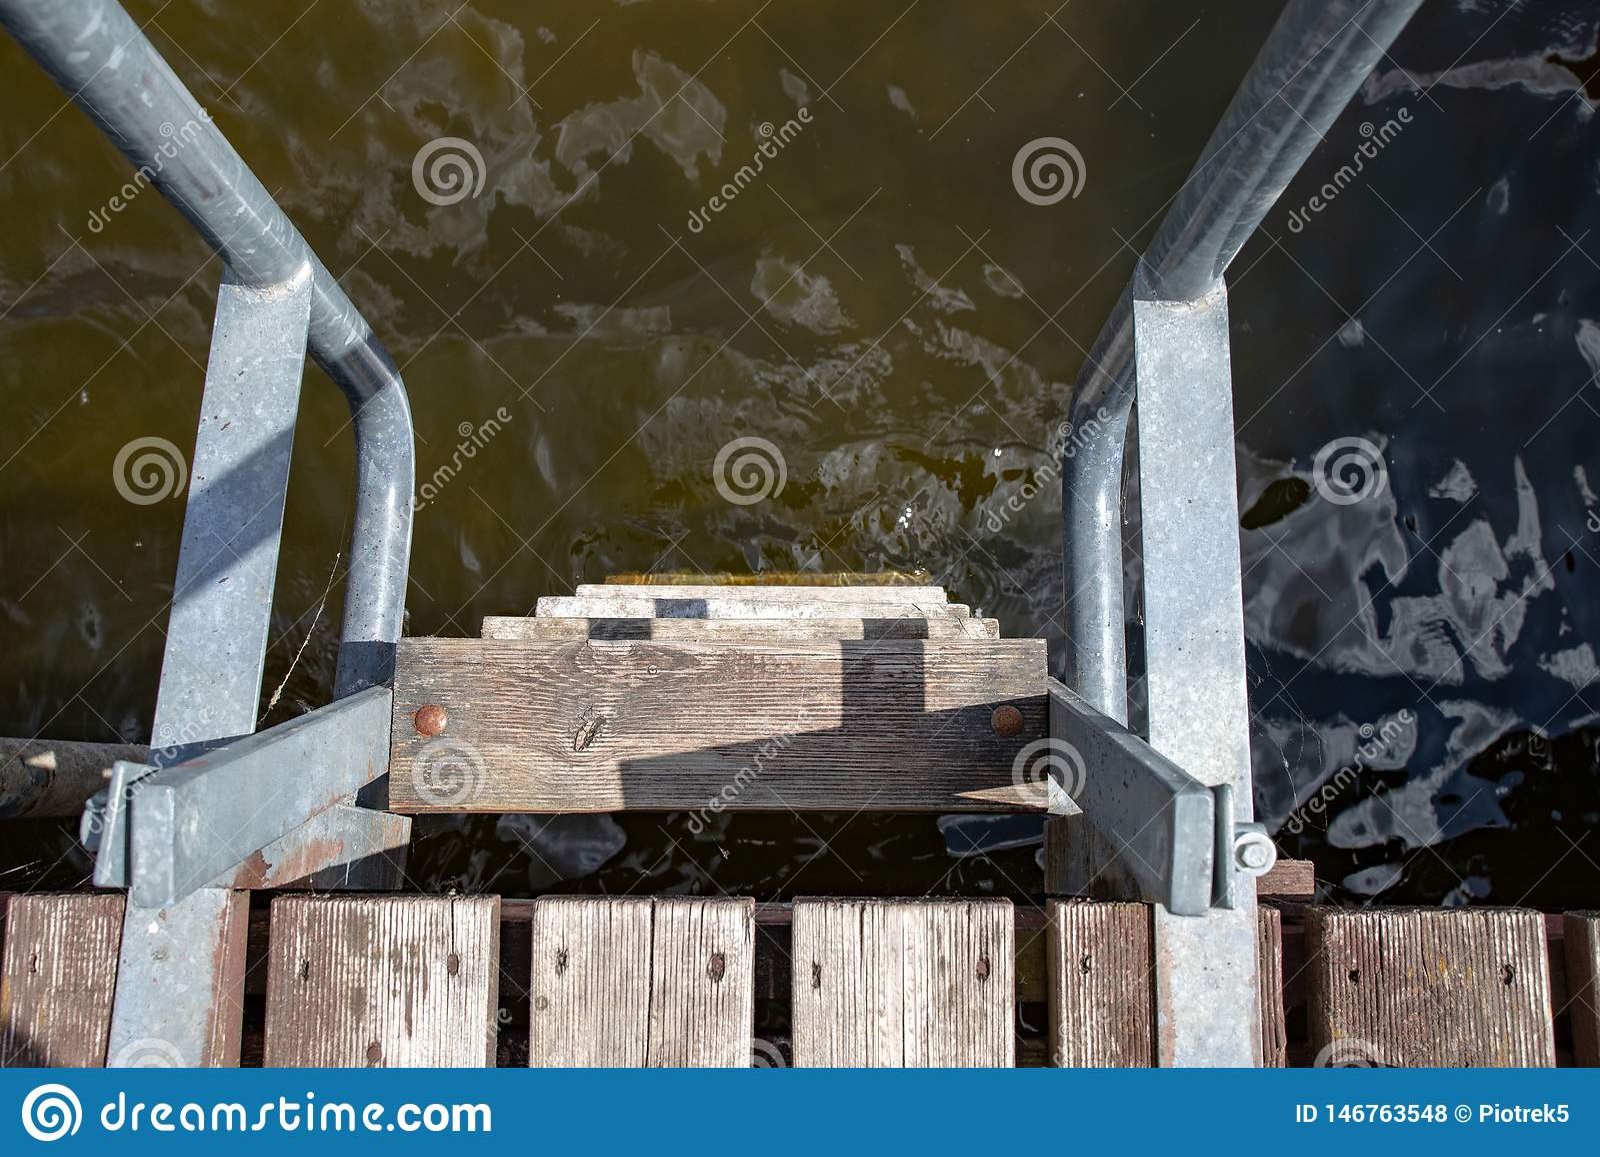 Лестница металла на деревянной пристани Спуск к воде на озере